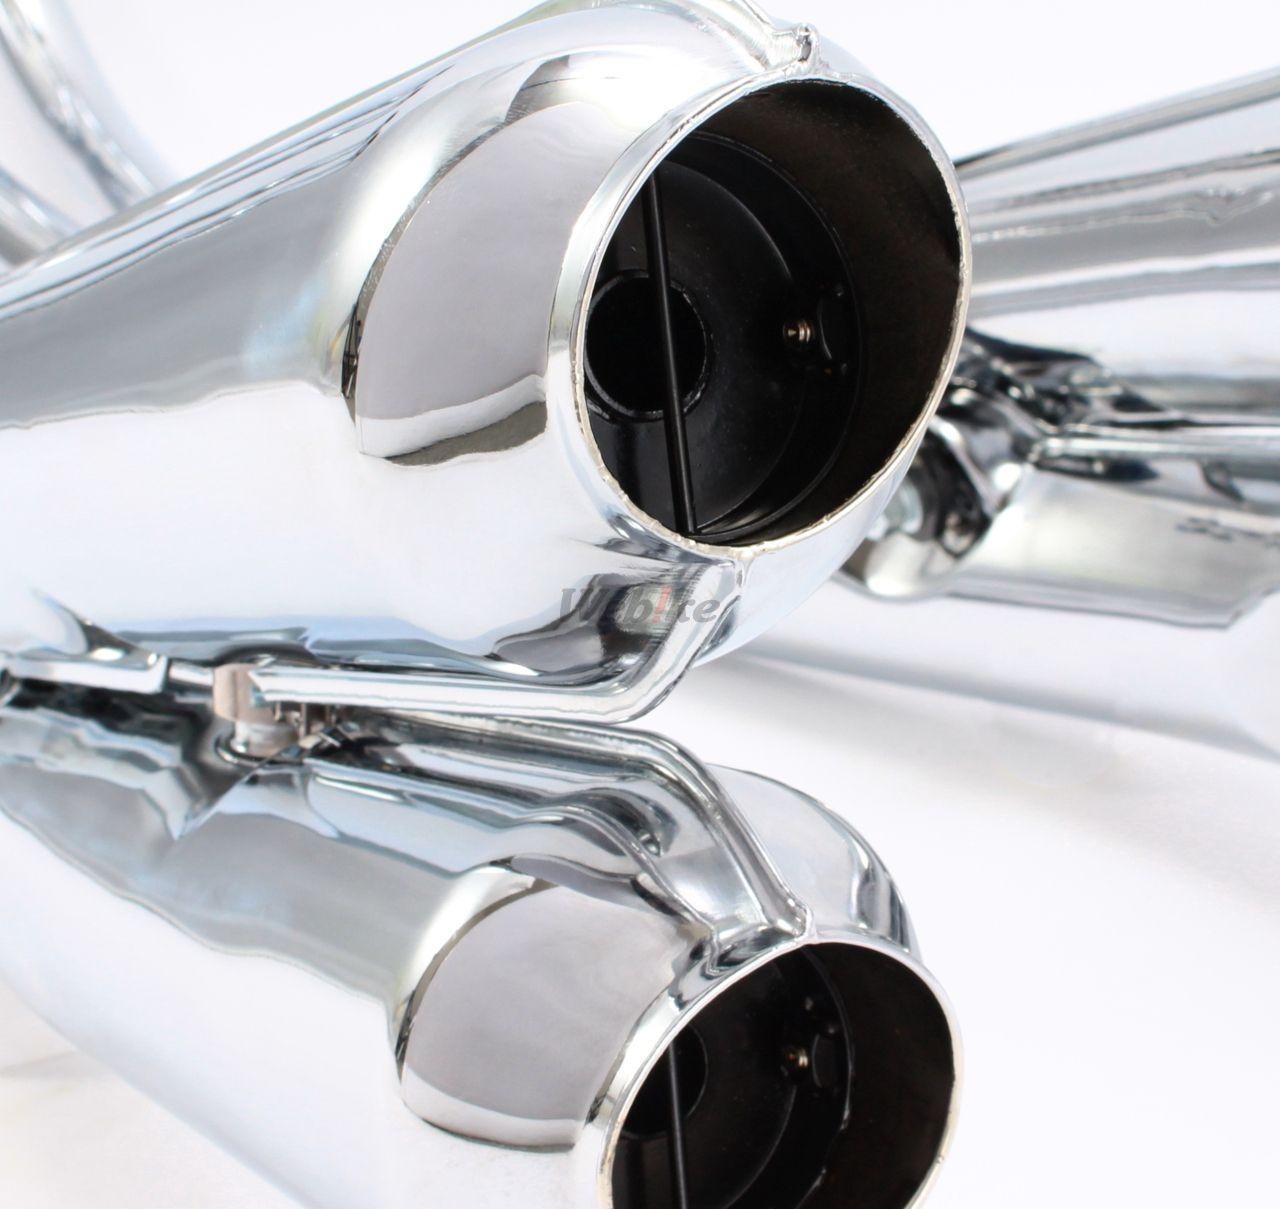 【DOREMI COLLECTION】4尾管型式全段排氣管 - 「Webike-摩托百貨」